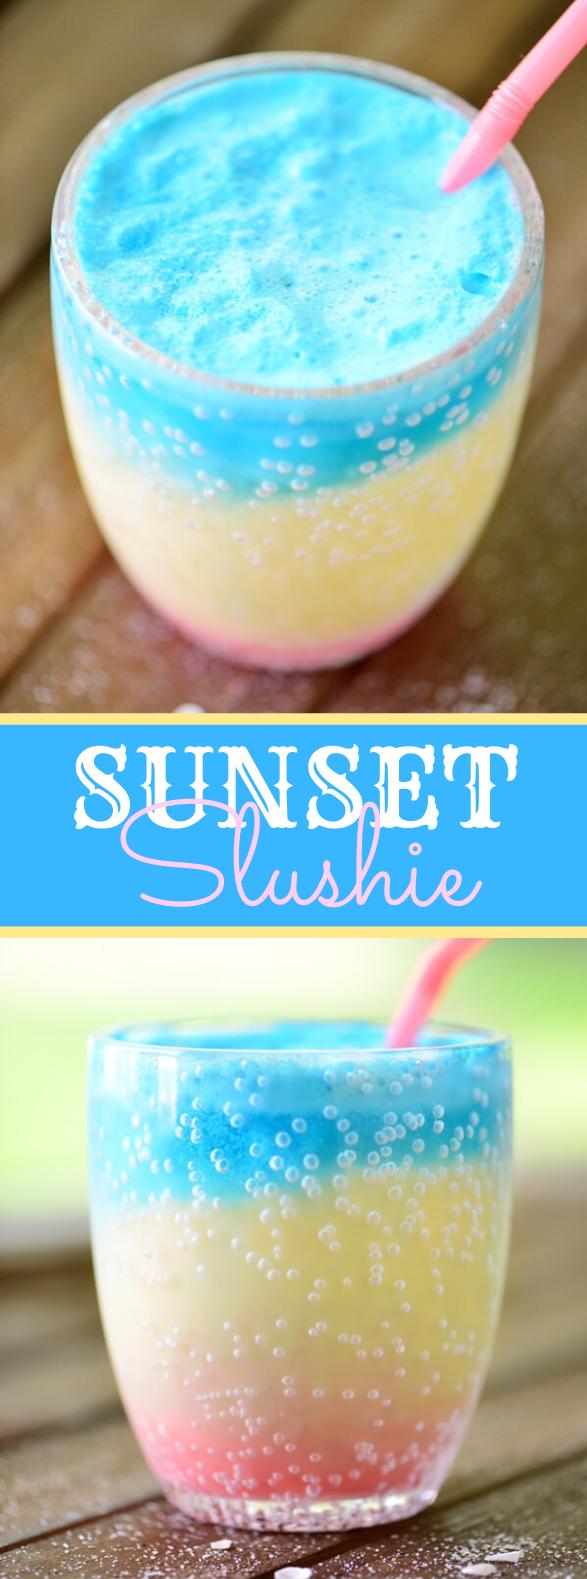 Sunset Slushie Recipe #drinks #kidfriendly